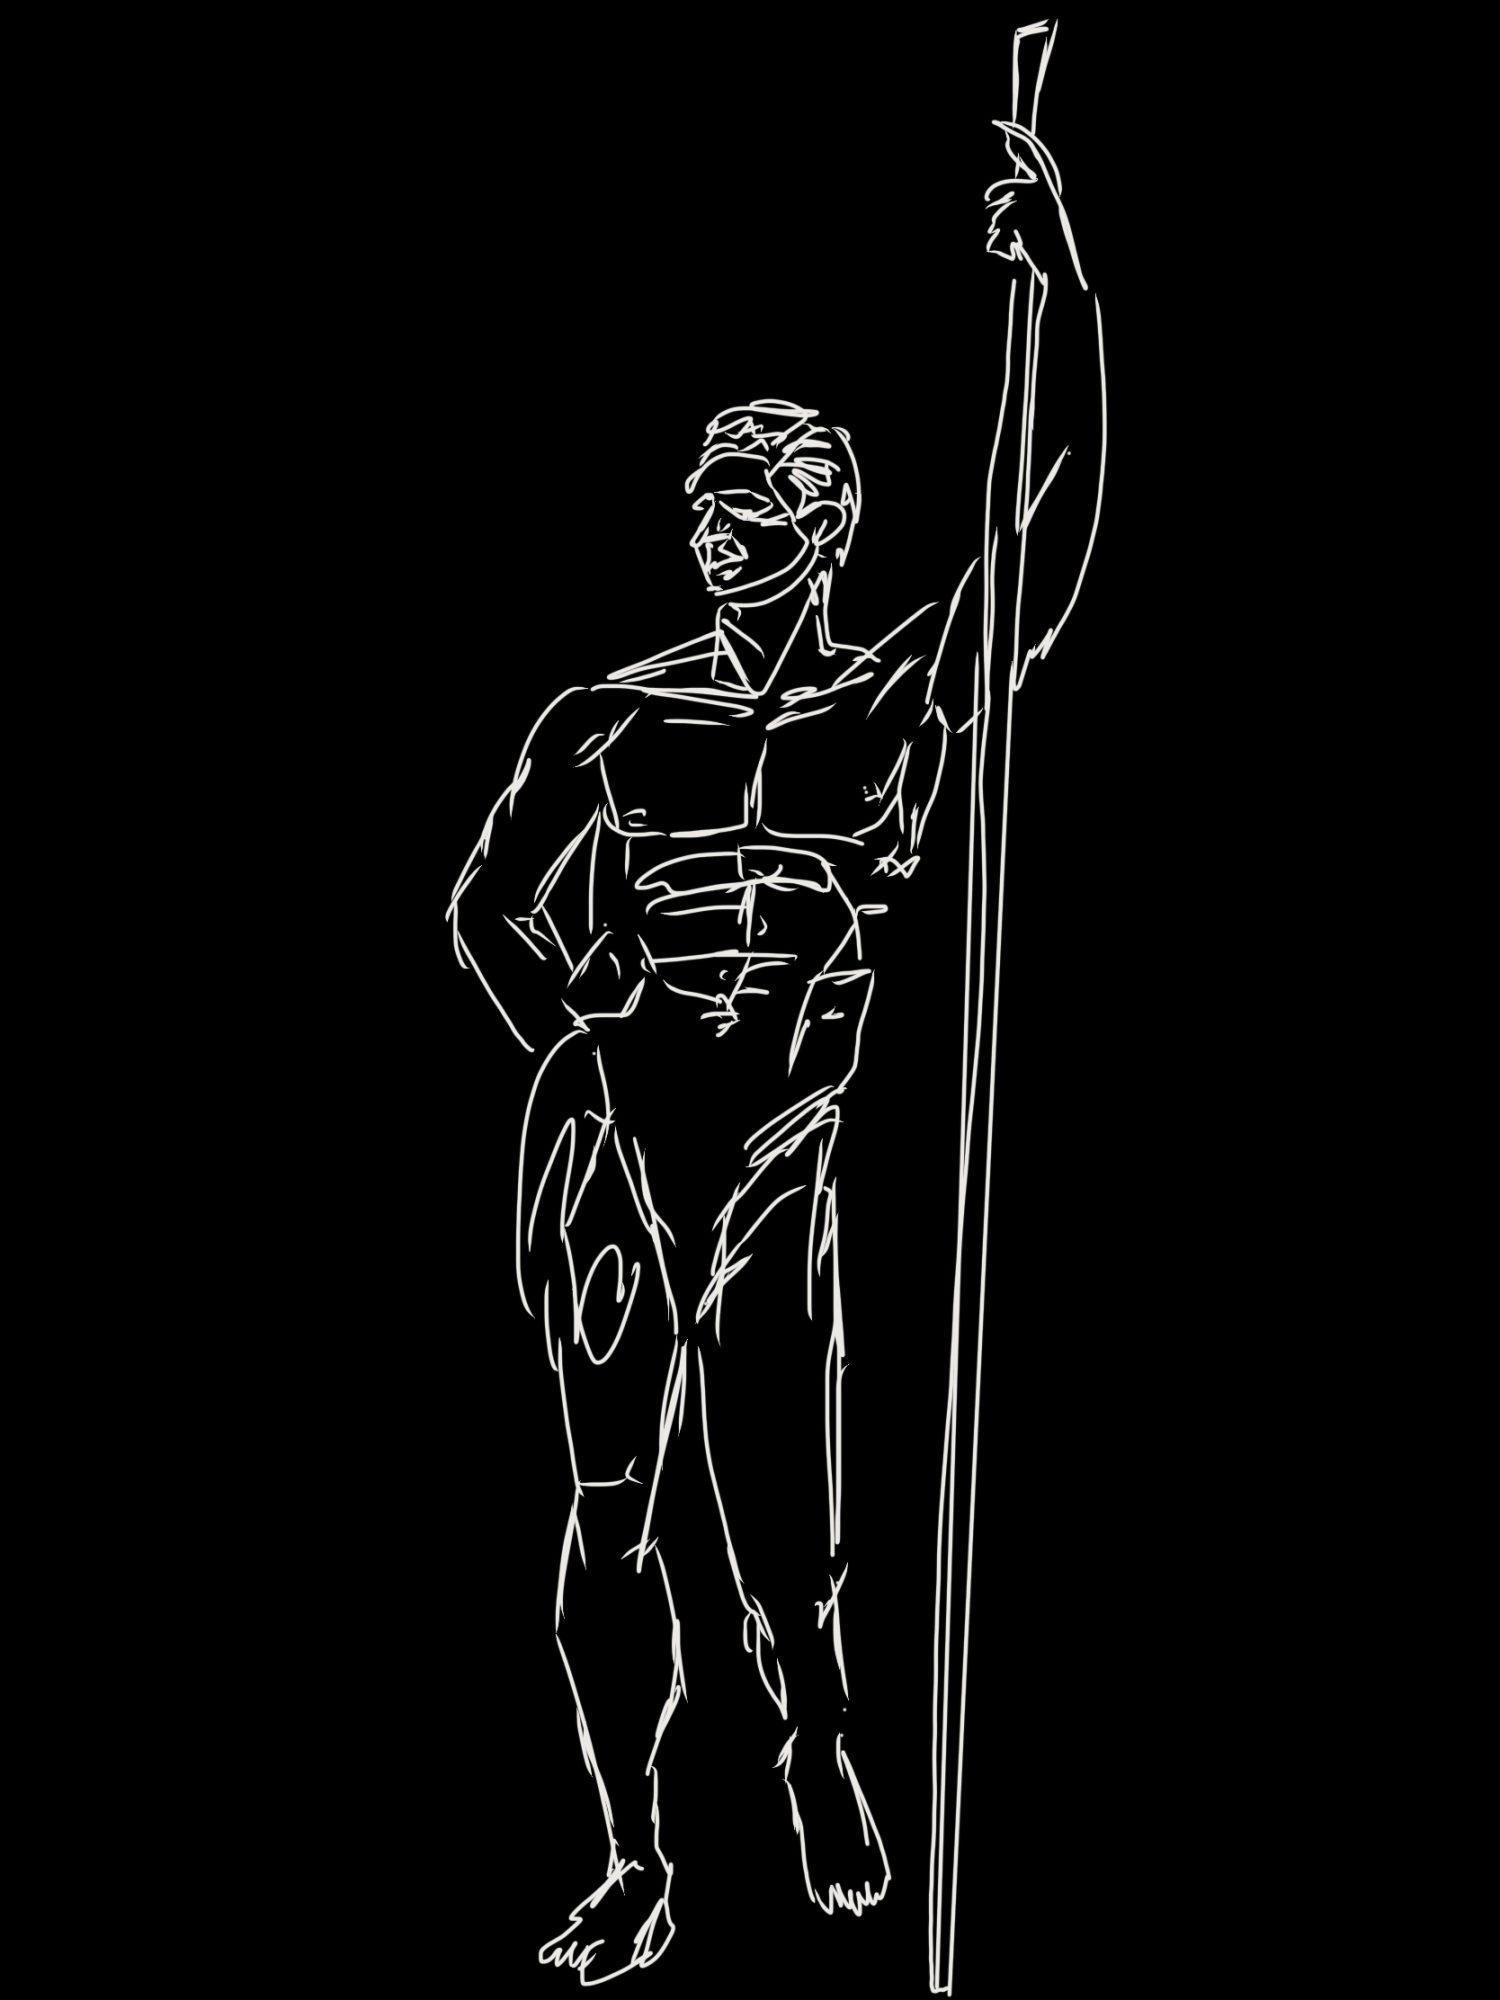 Ideal Ancient Greek physique.